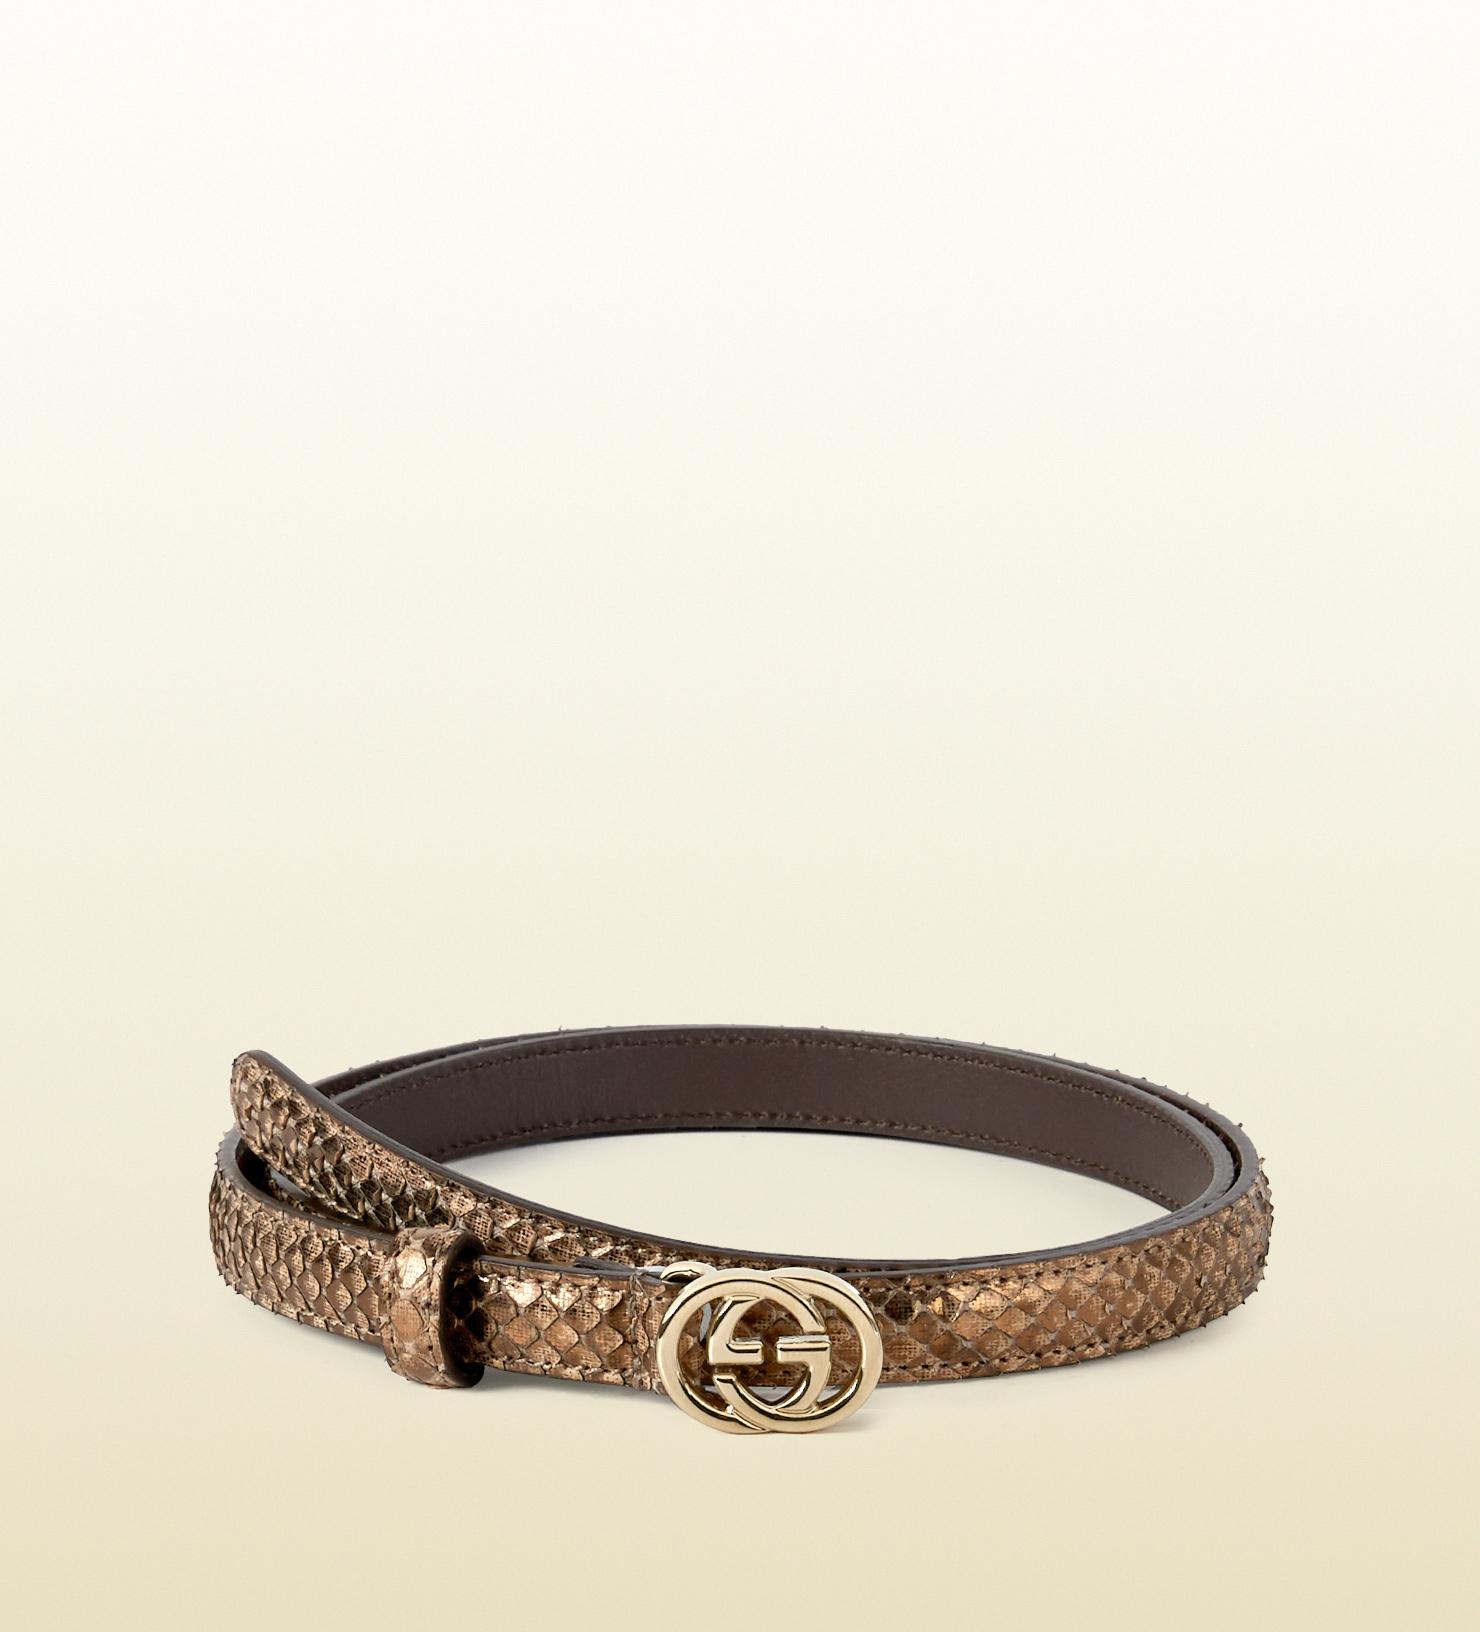 ed38db794 Gucci Python Skinny Belt With Interlocking G Buckle in Metallic - Lyst